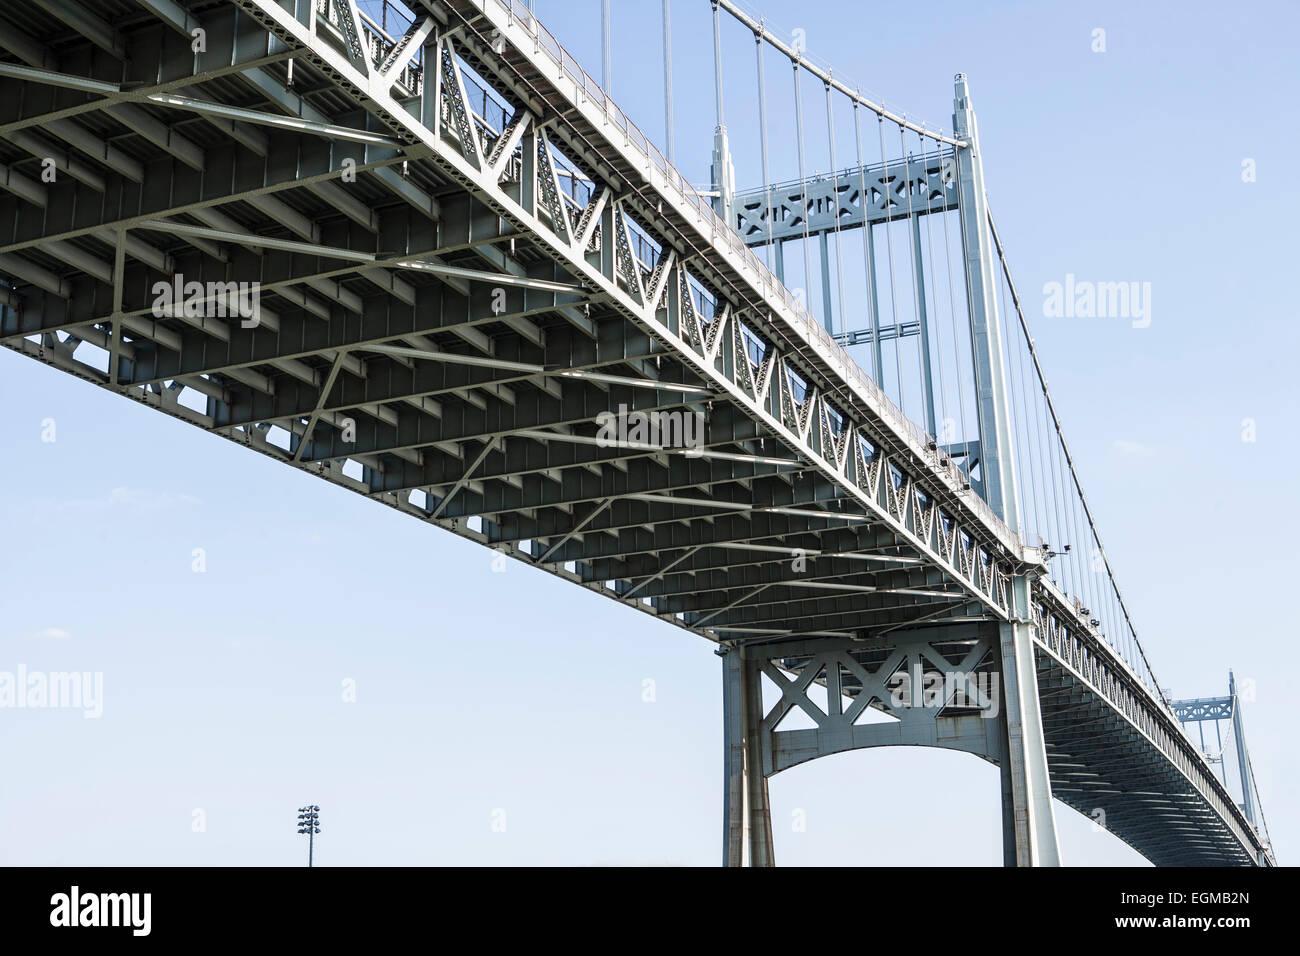 RFK Triborough Bridge, Low Angle View, New York City, USA - Stock Image